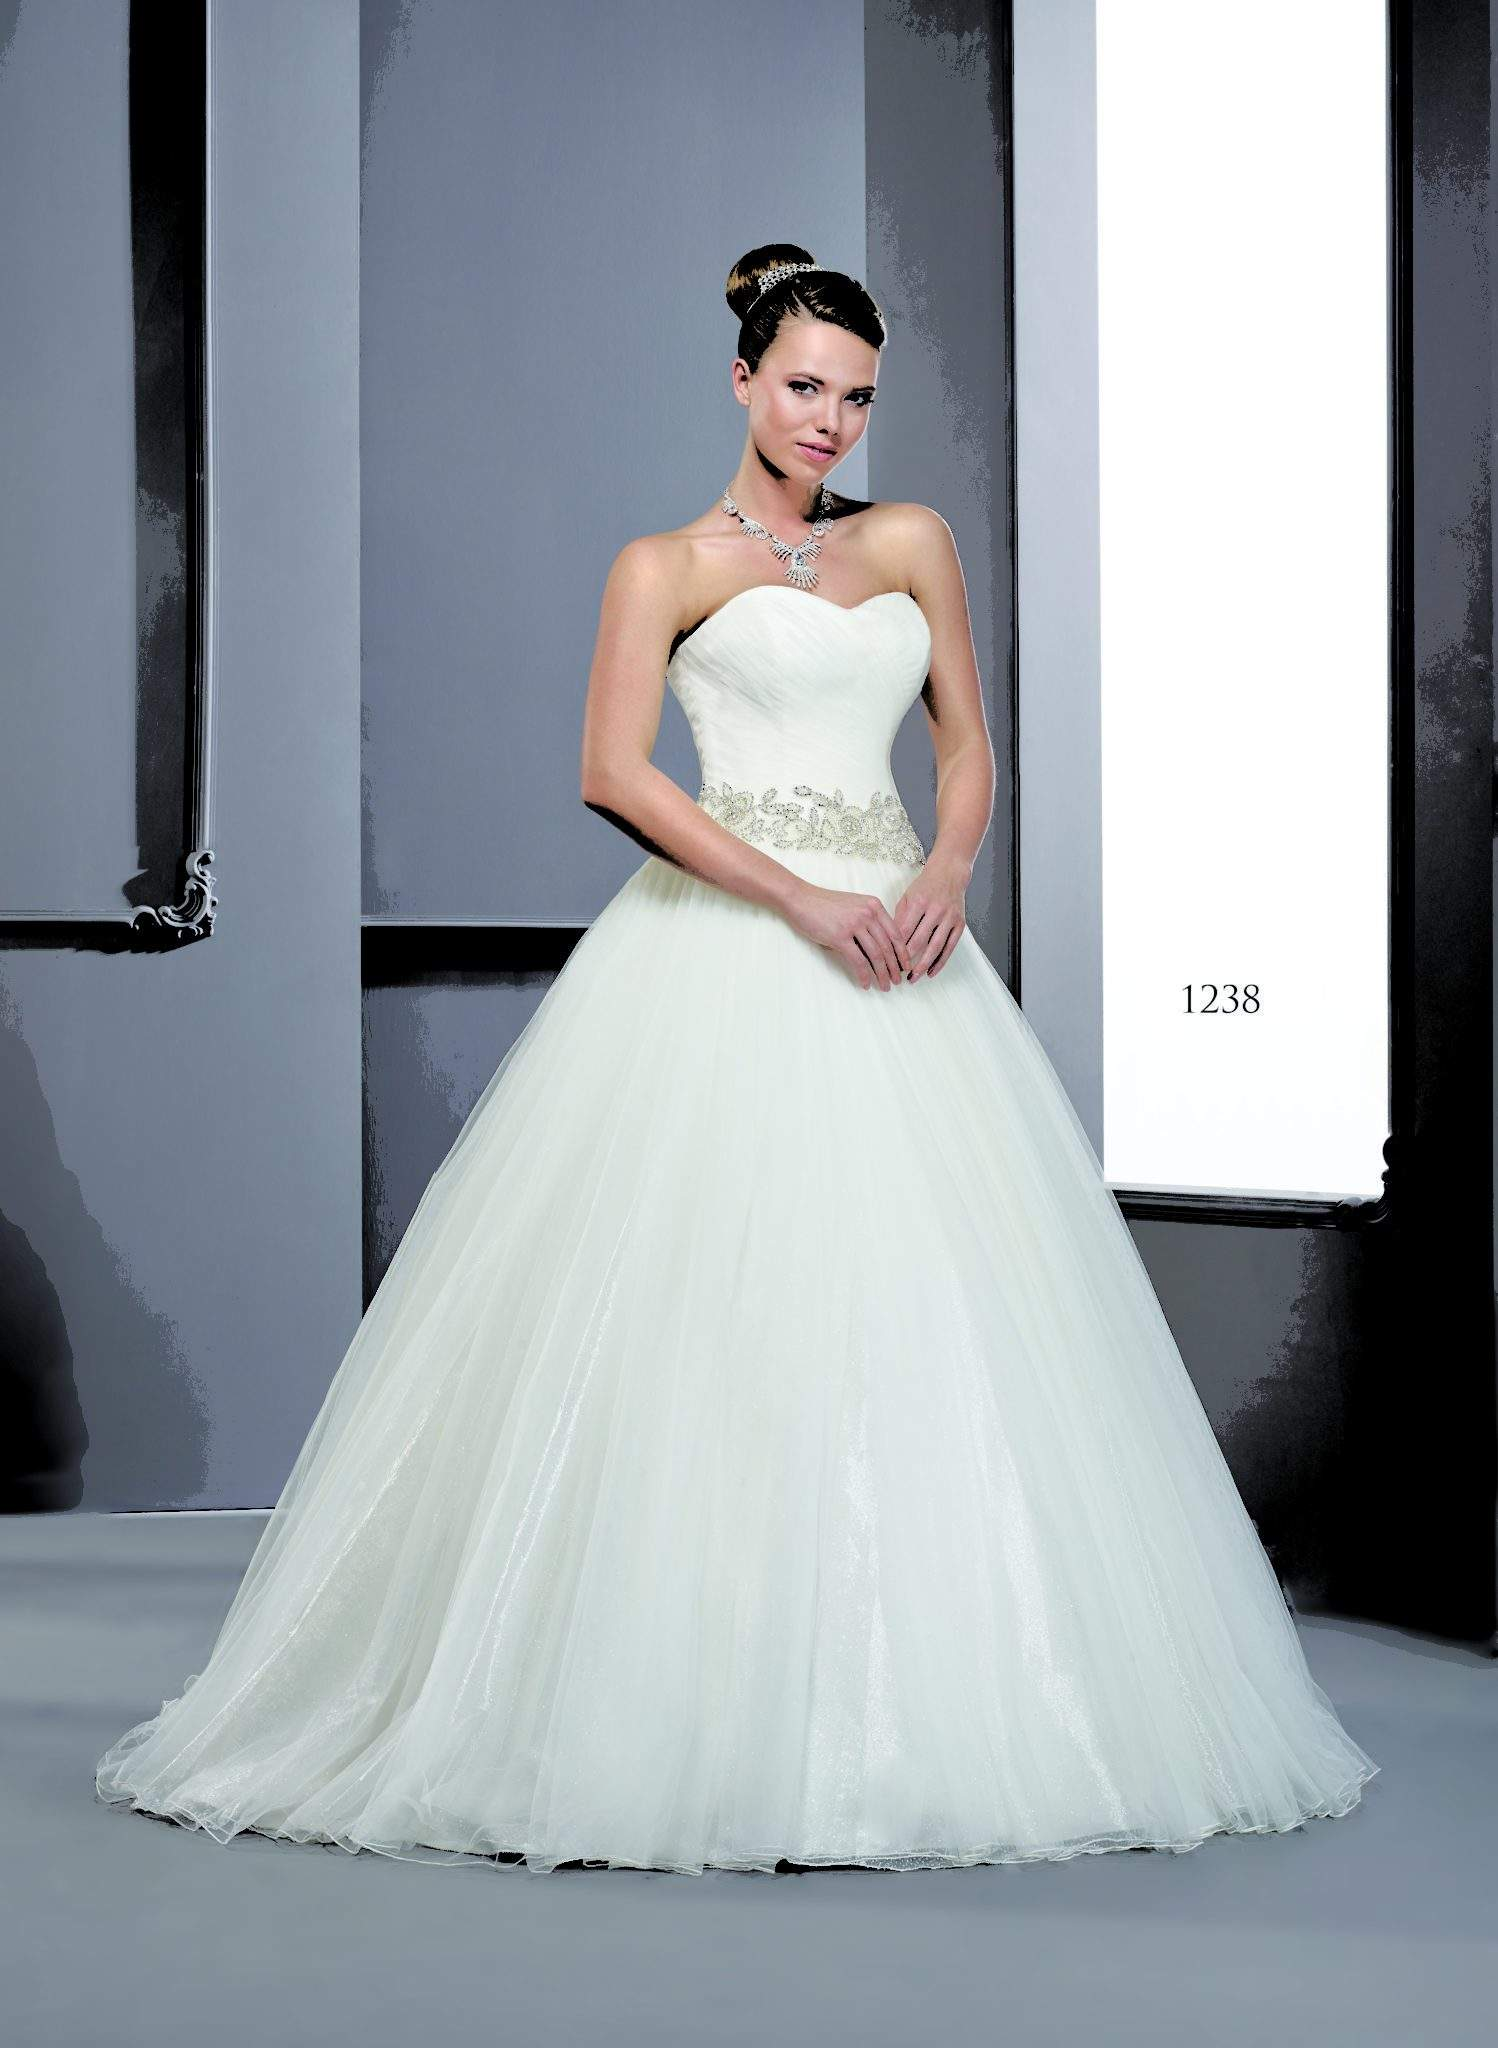 94288ff0092 Organza ball gown Wedding Dresses - Darius Cordell Fashion Ltd